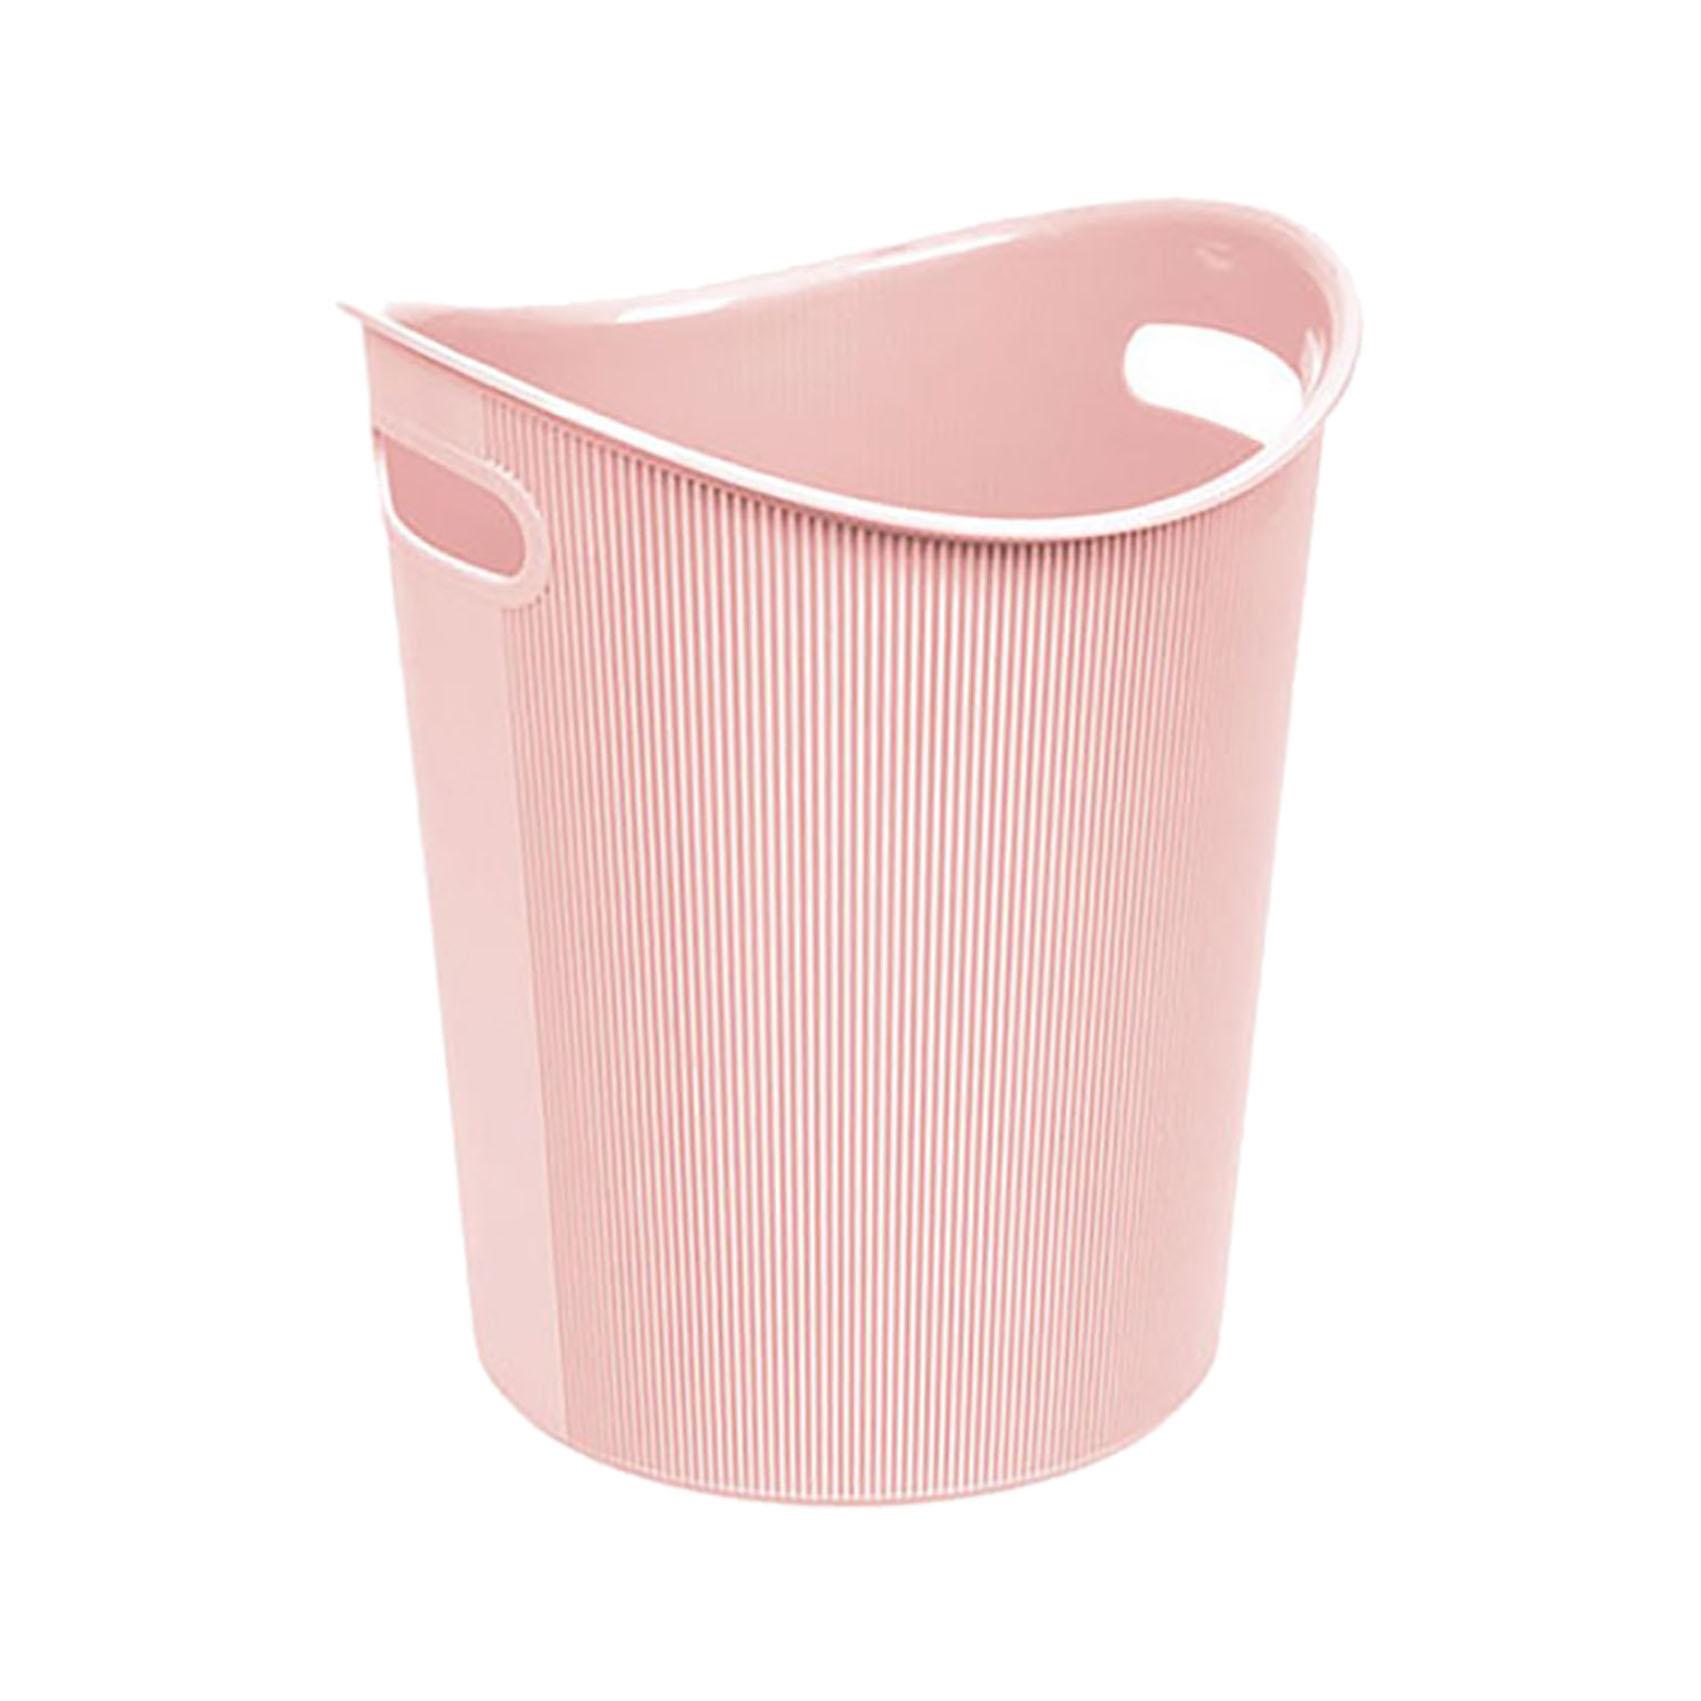 قیمت خرید سطل زباله لیمون مدل LB140835 اورجینال